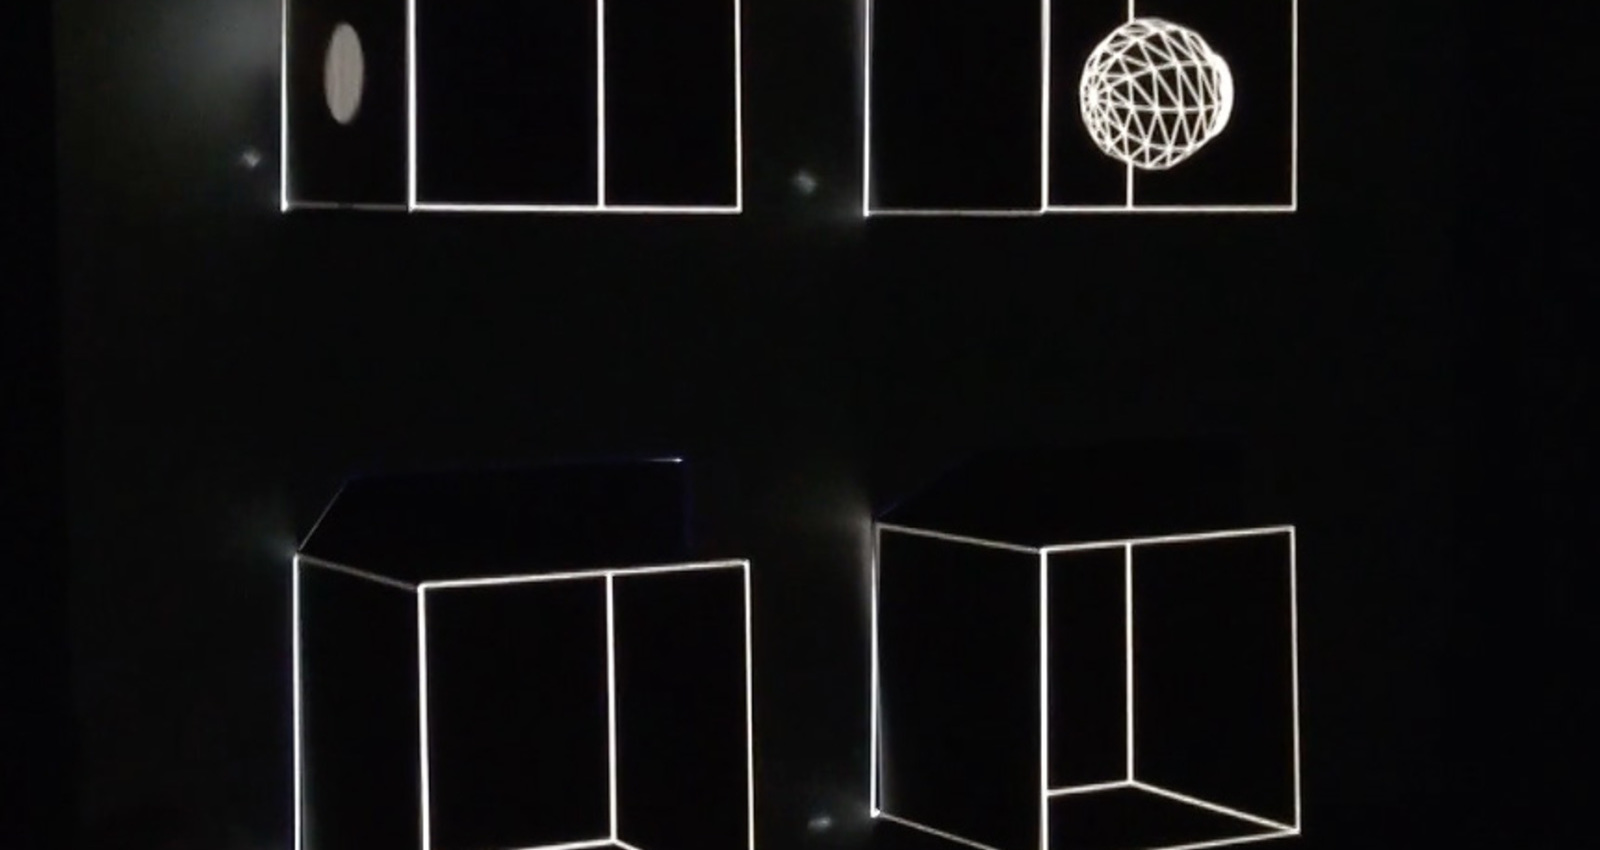 Portal 1.0